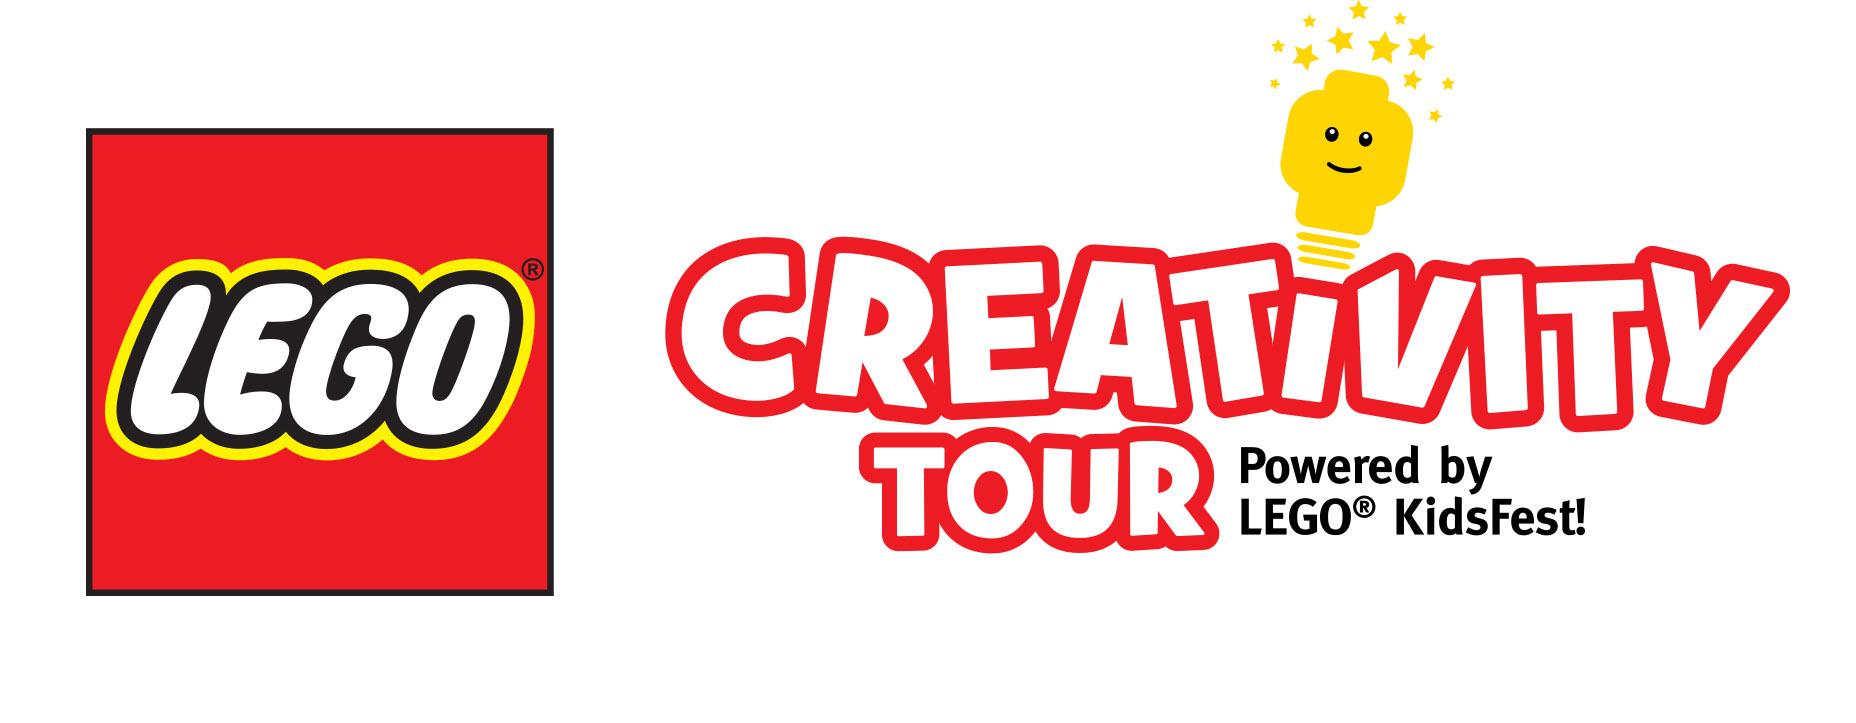 LEGO Creativity Tour logo_FINAL